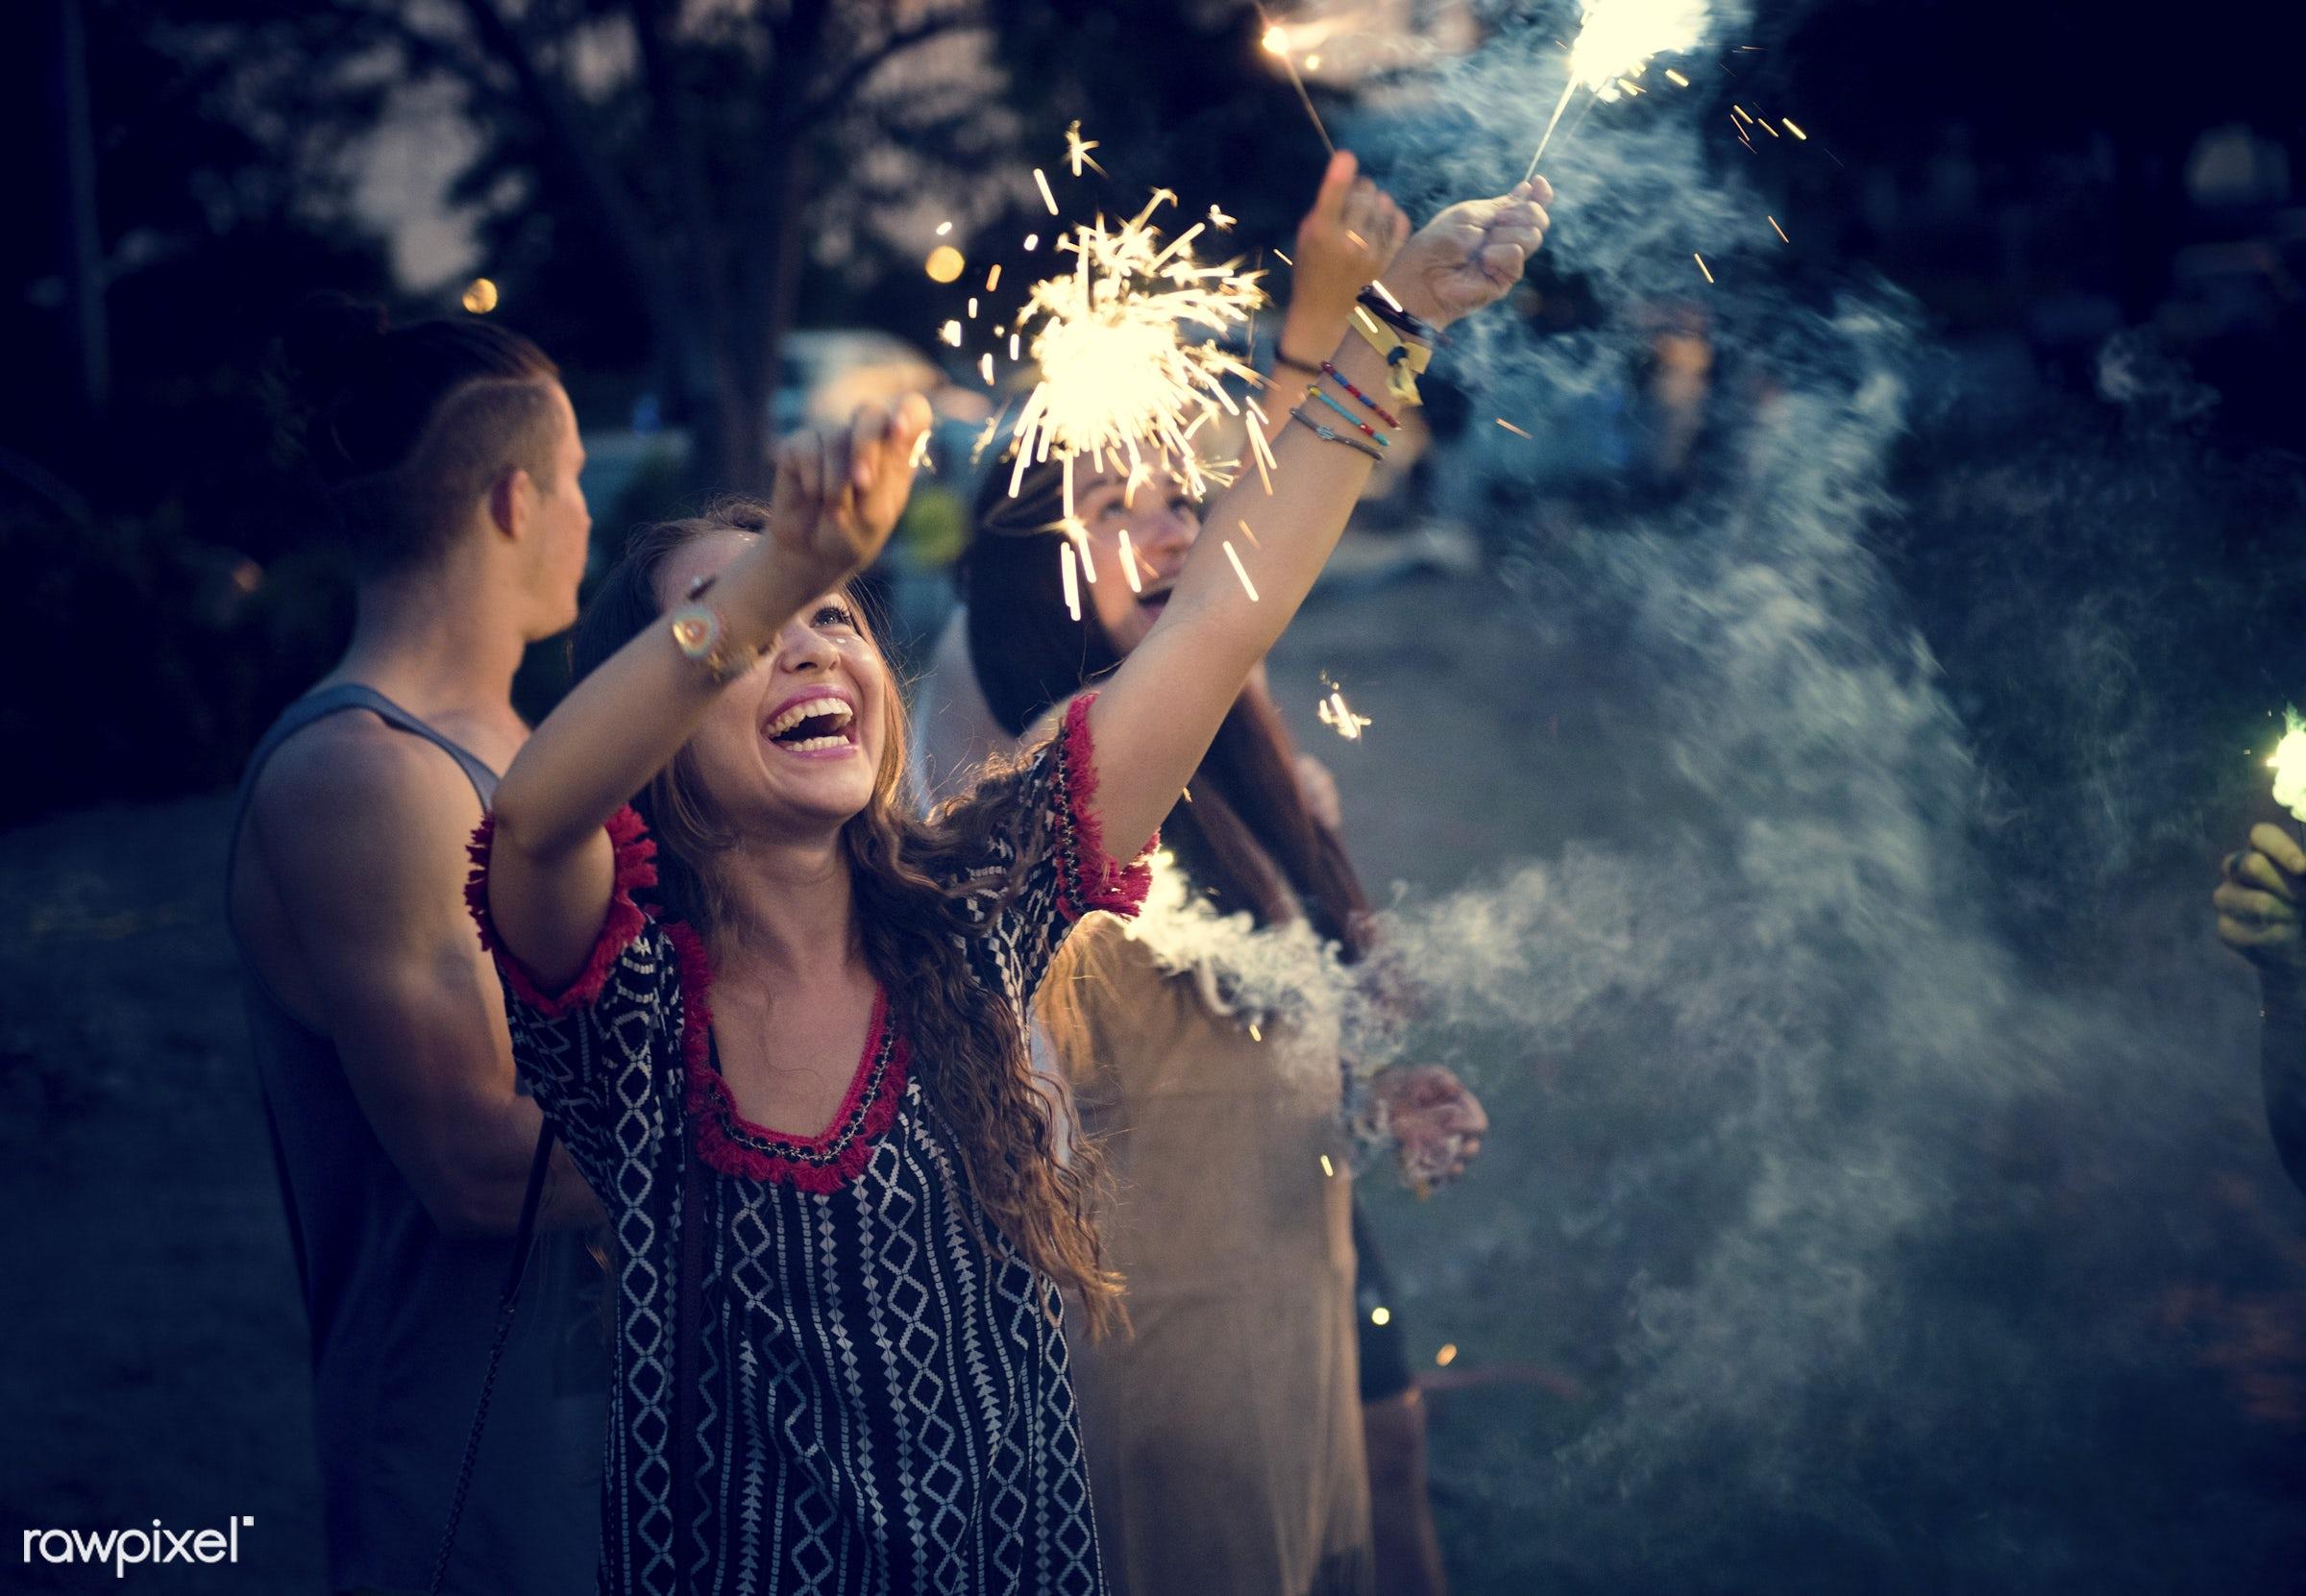 sparkler, activity, adults, carefree, concert, crowd, diversity, enjoying, enjoyment, entertainment, event, festival,...